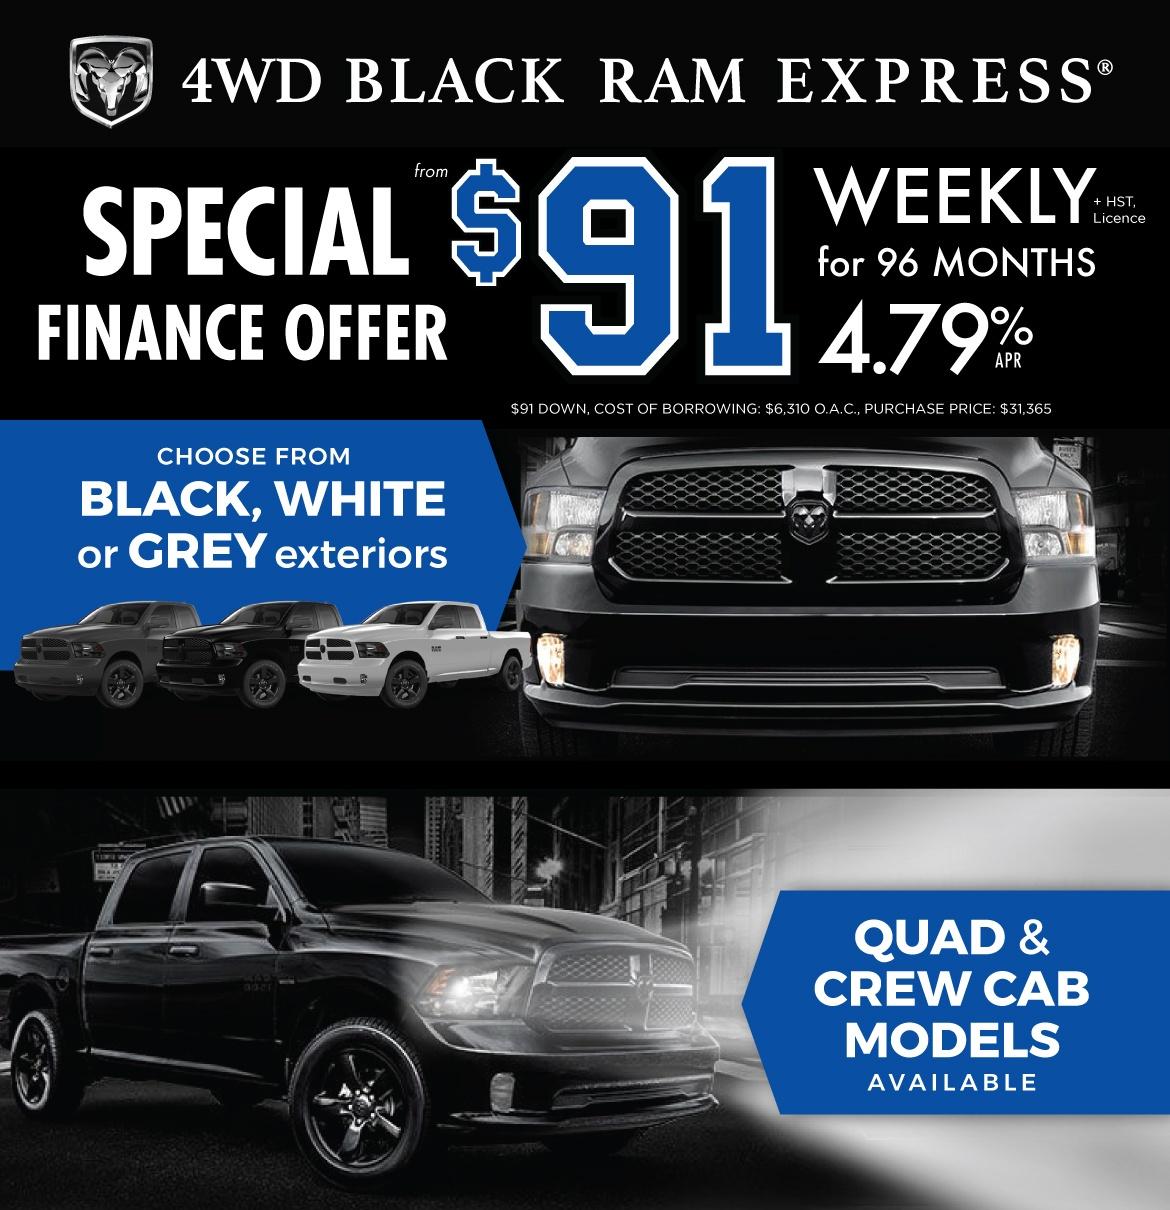 CD-RAM-Express-Hero-4-1170x1210-Oct-2018